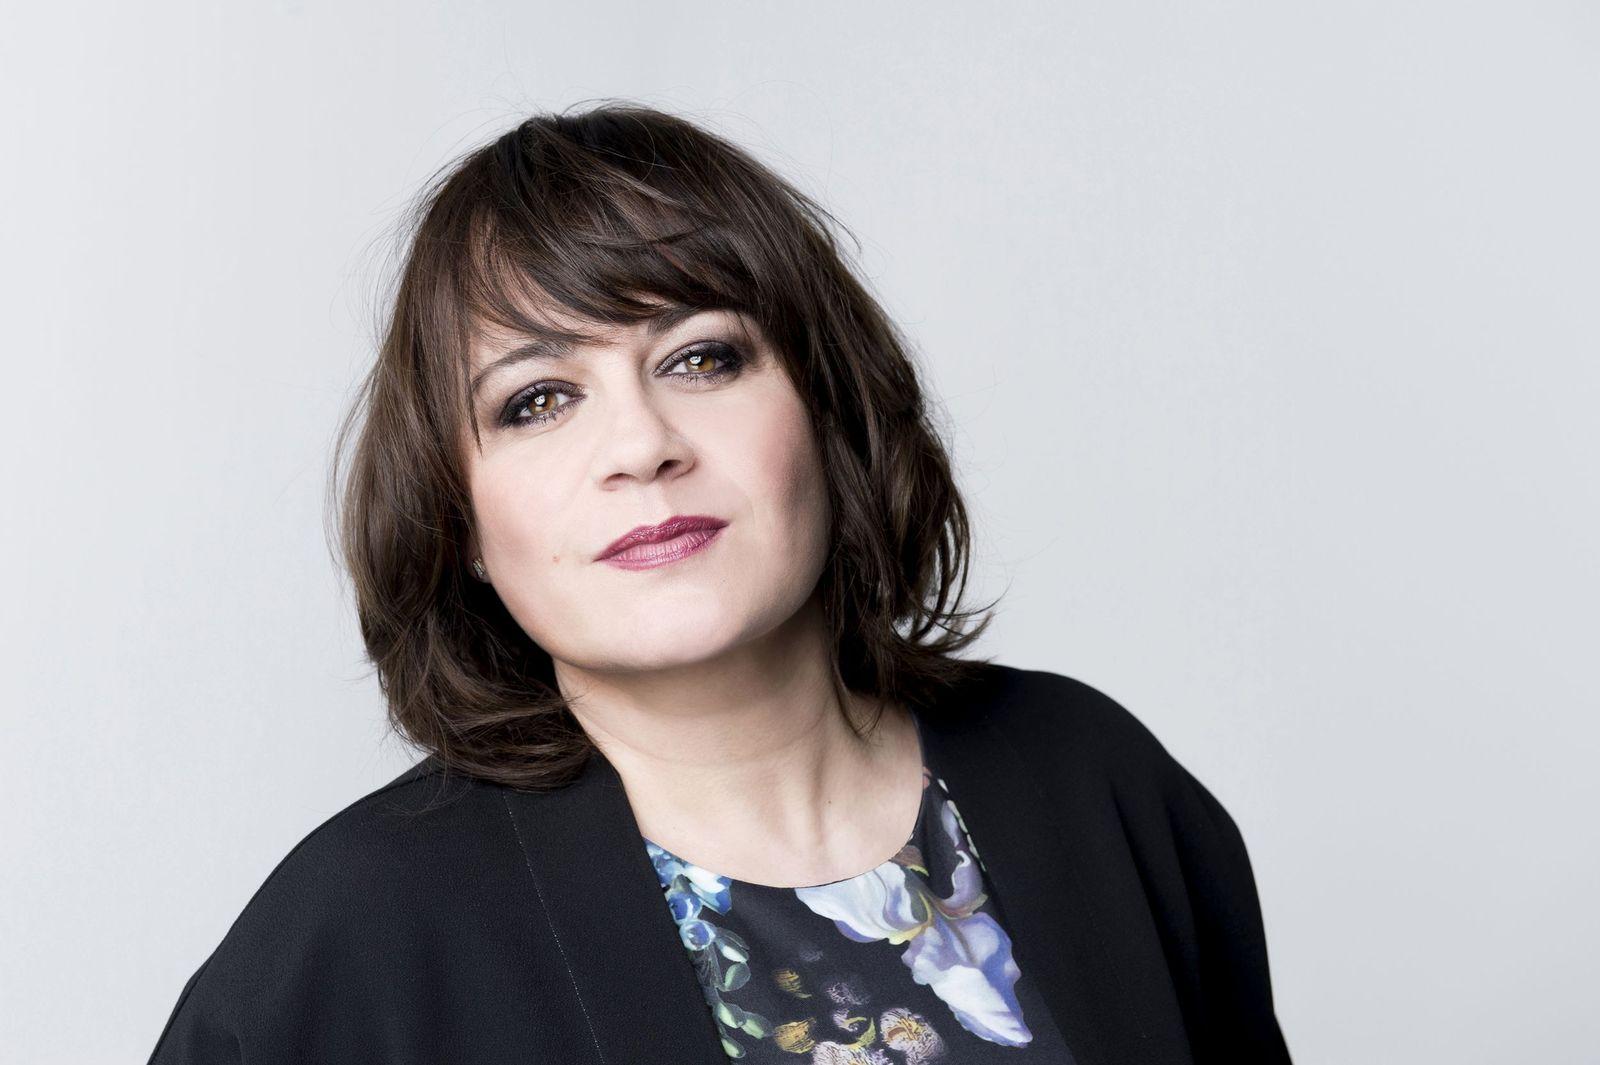 EINMALIGE VERWENDUNG ESC 2015/ France: Lisa Angell